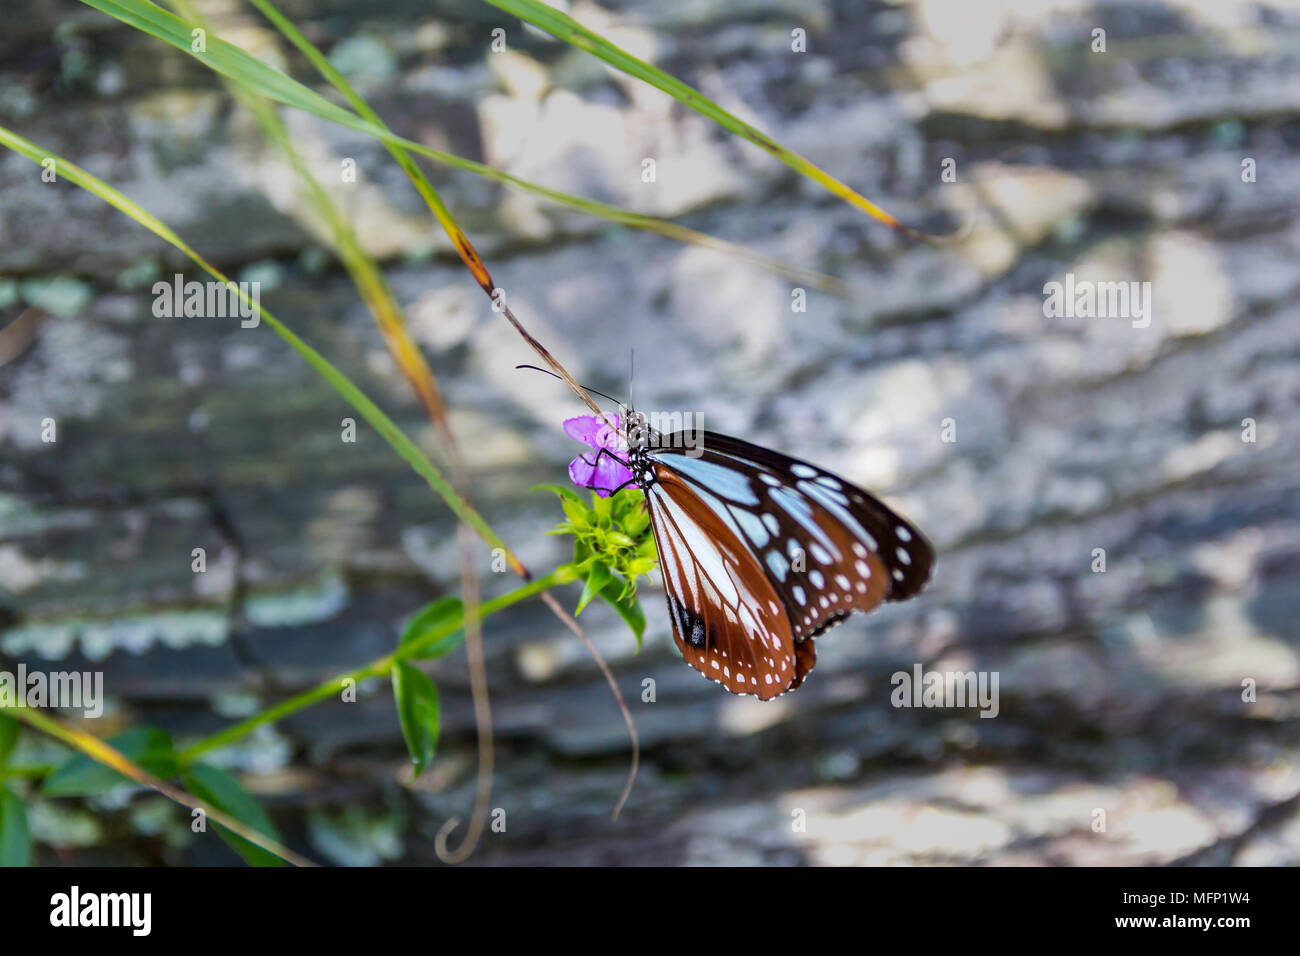 Chestnut tiger butterfly (Parantica sita) on a flower; Sadamisaki Peninsula, Ehime Prefecture, Japan - Stock Image